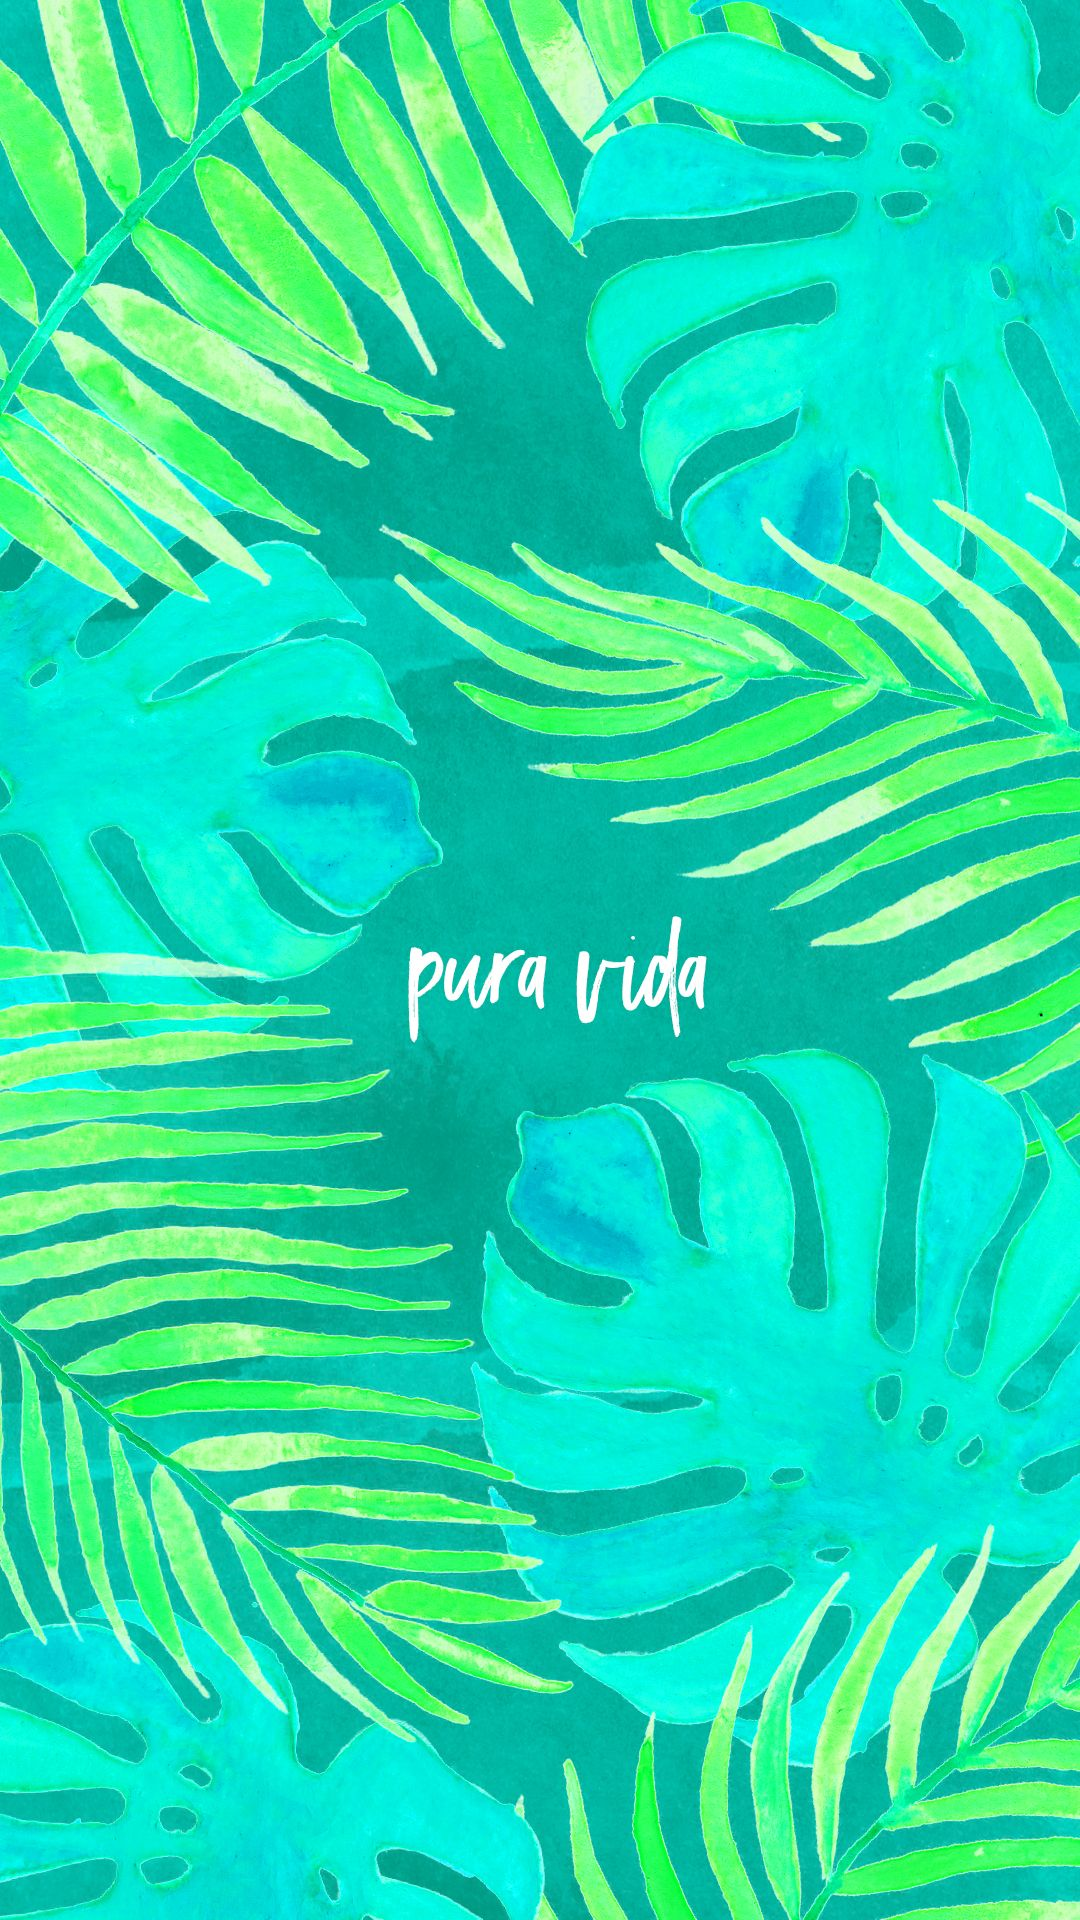 pura vida wallpaper  The Pura Vida Bracelets Blog - Summer Digi Downloads | Backgrounds ...